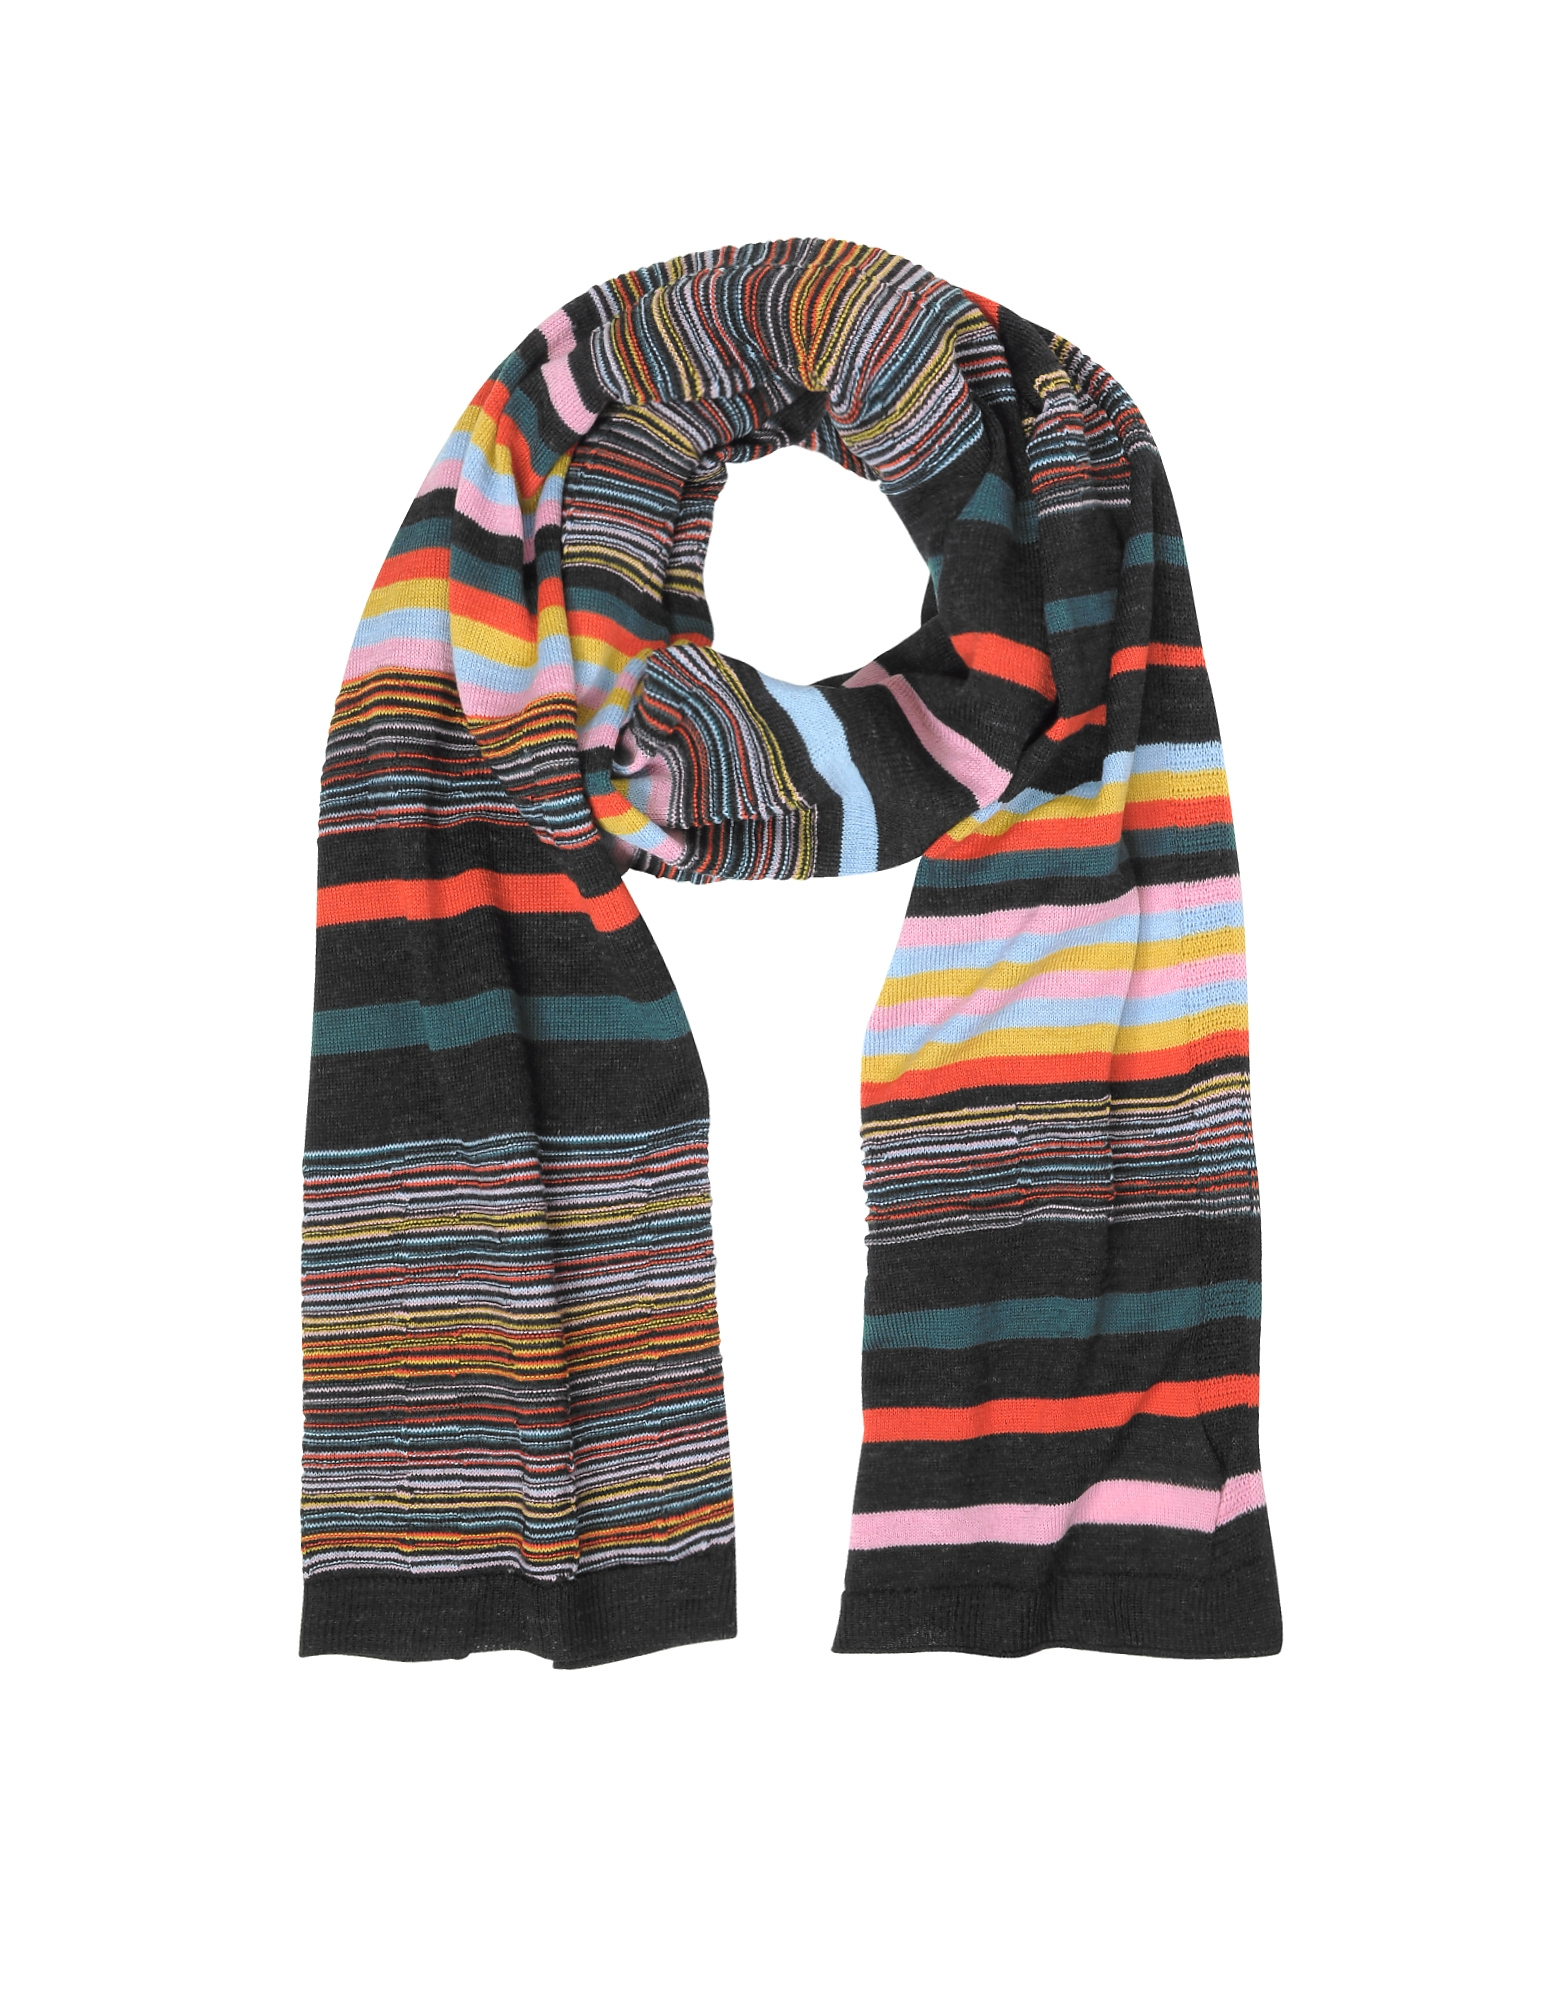 Missoni Men's Scarves, Striped Wool Blend Men's Long Scarf